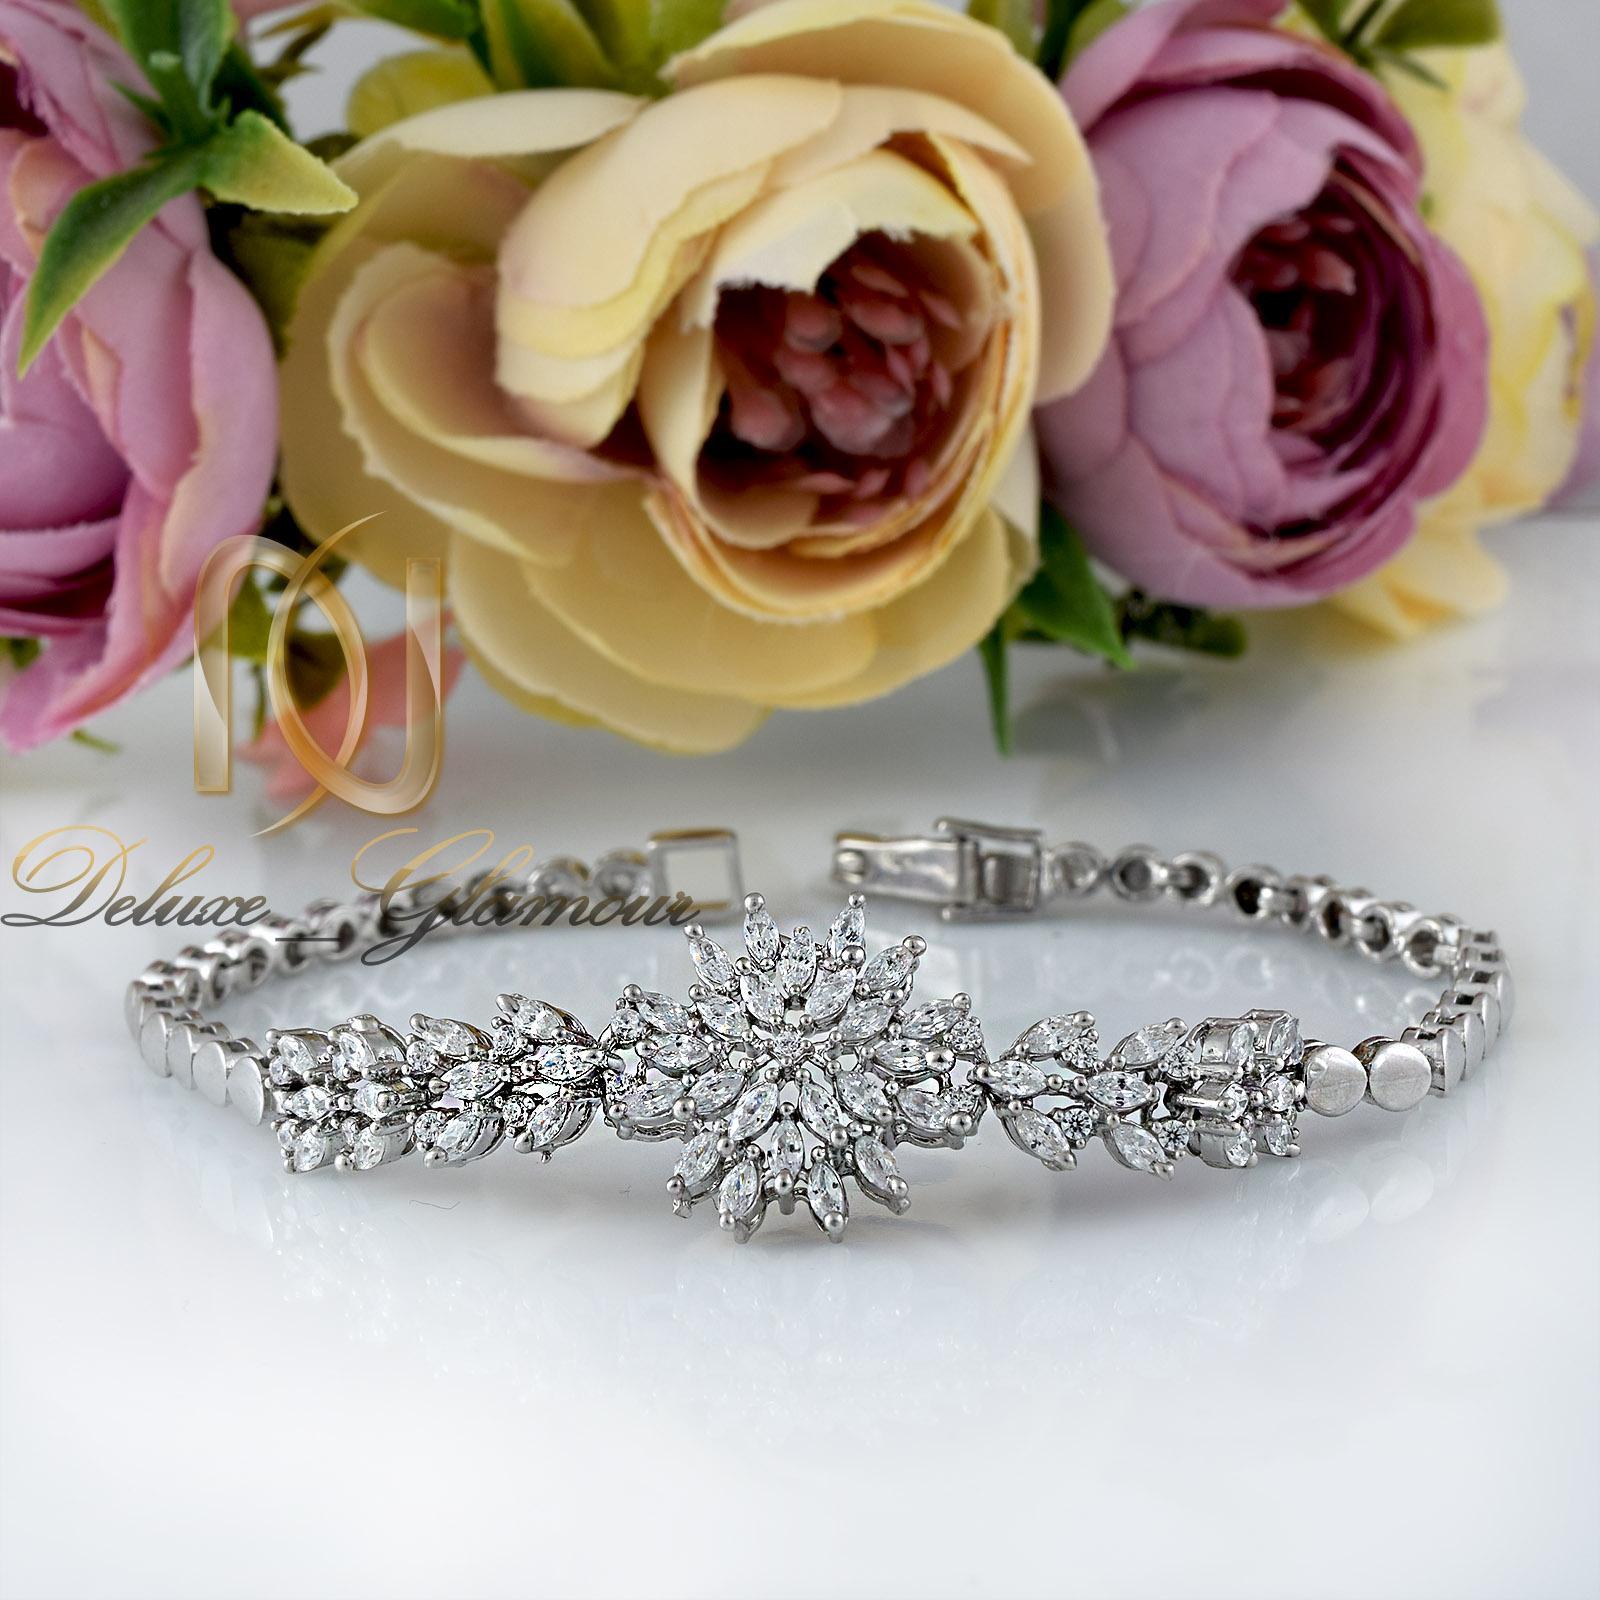 سرویس نقره عروس جواهری طرح هفت ns-n234